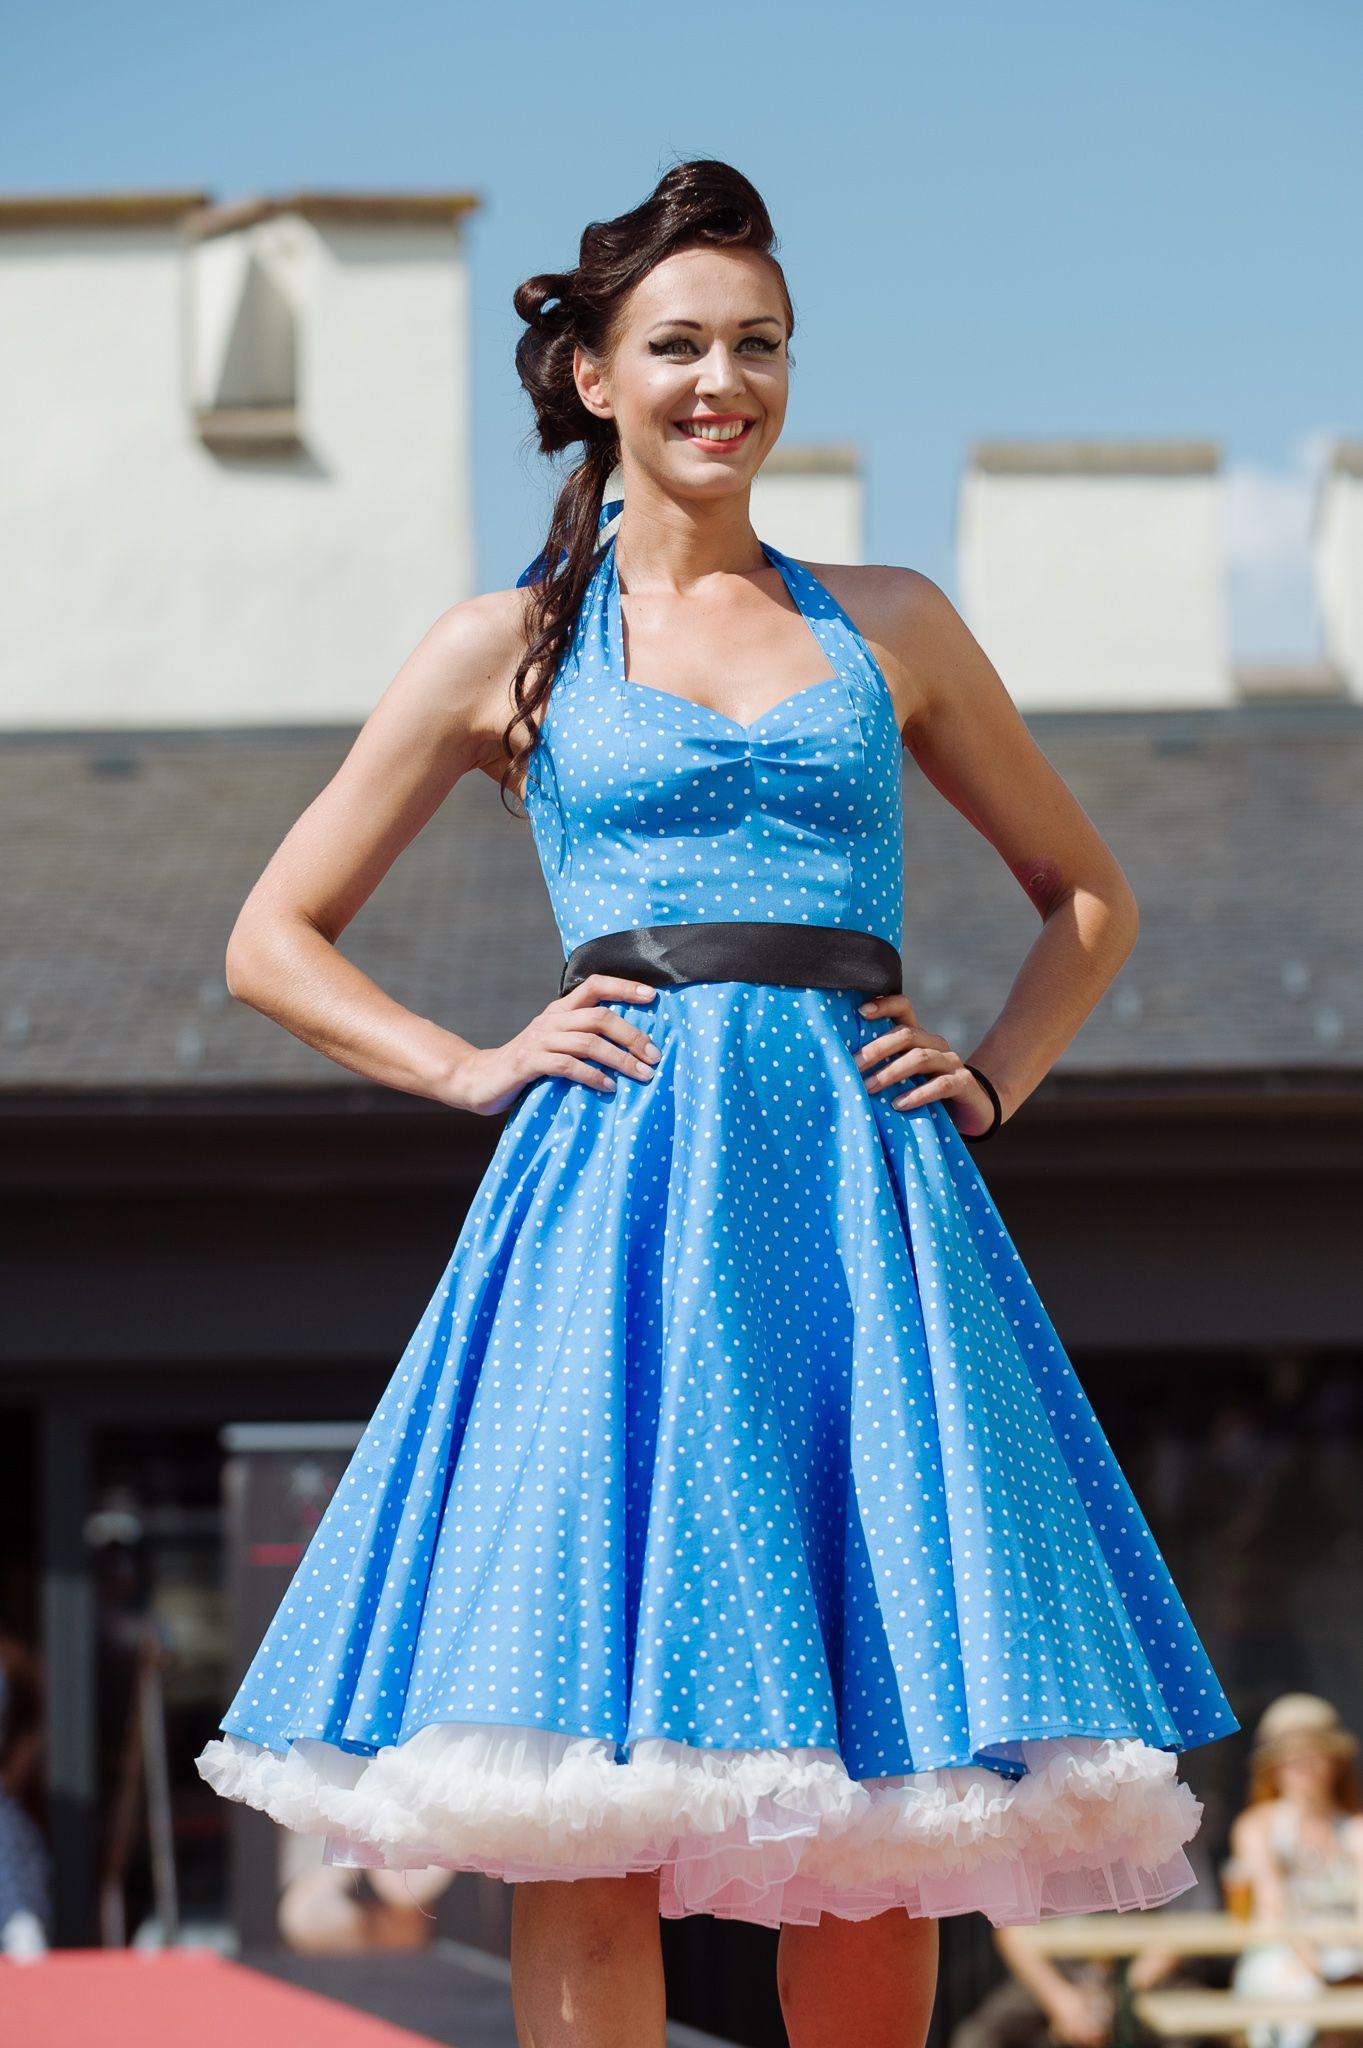 Modré bavlnené retro šaty s bielymi bodkami  b6a3d2f5d03